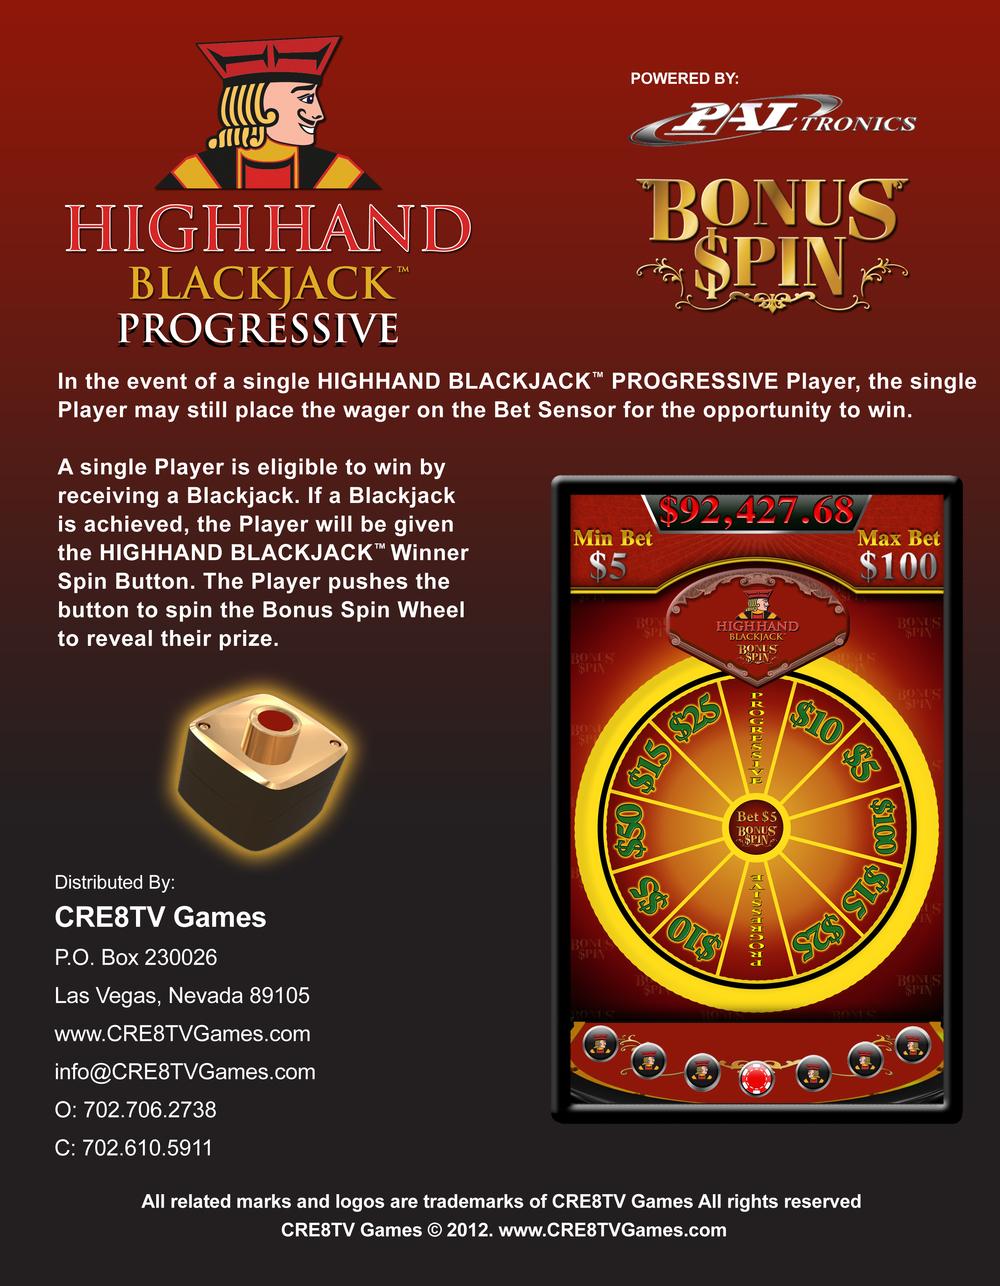 HighHand Blackjack Game SheetBACK2013 copy.jpg